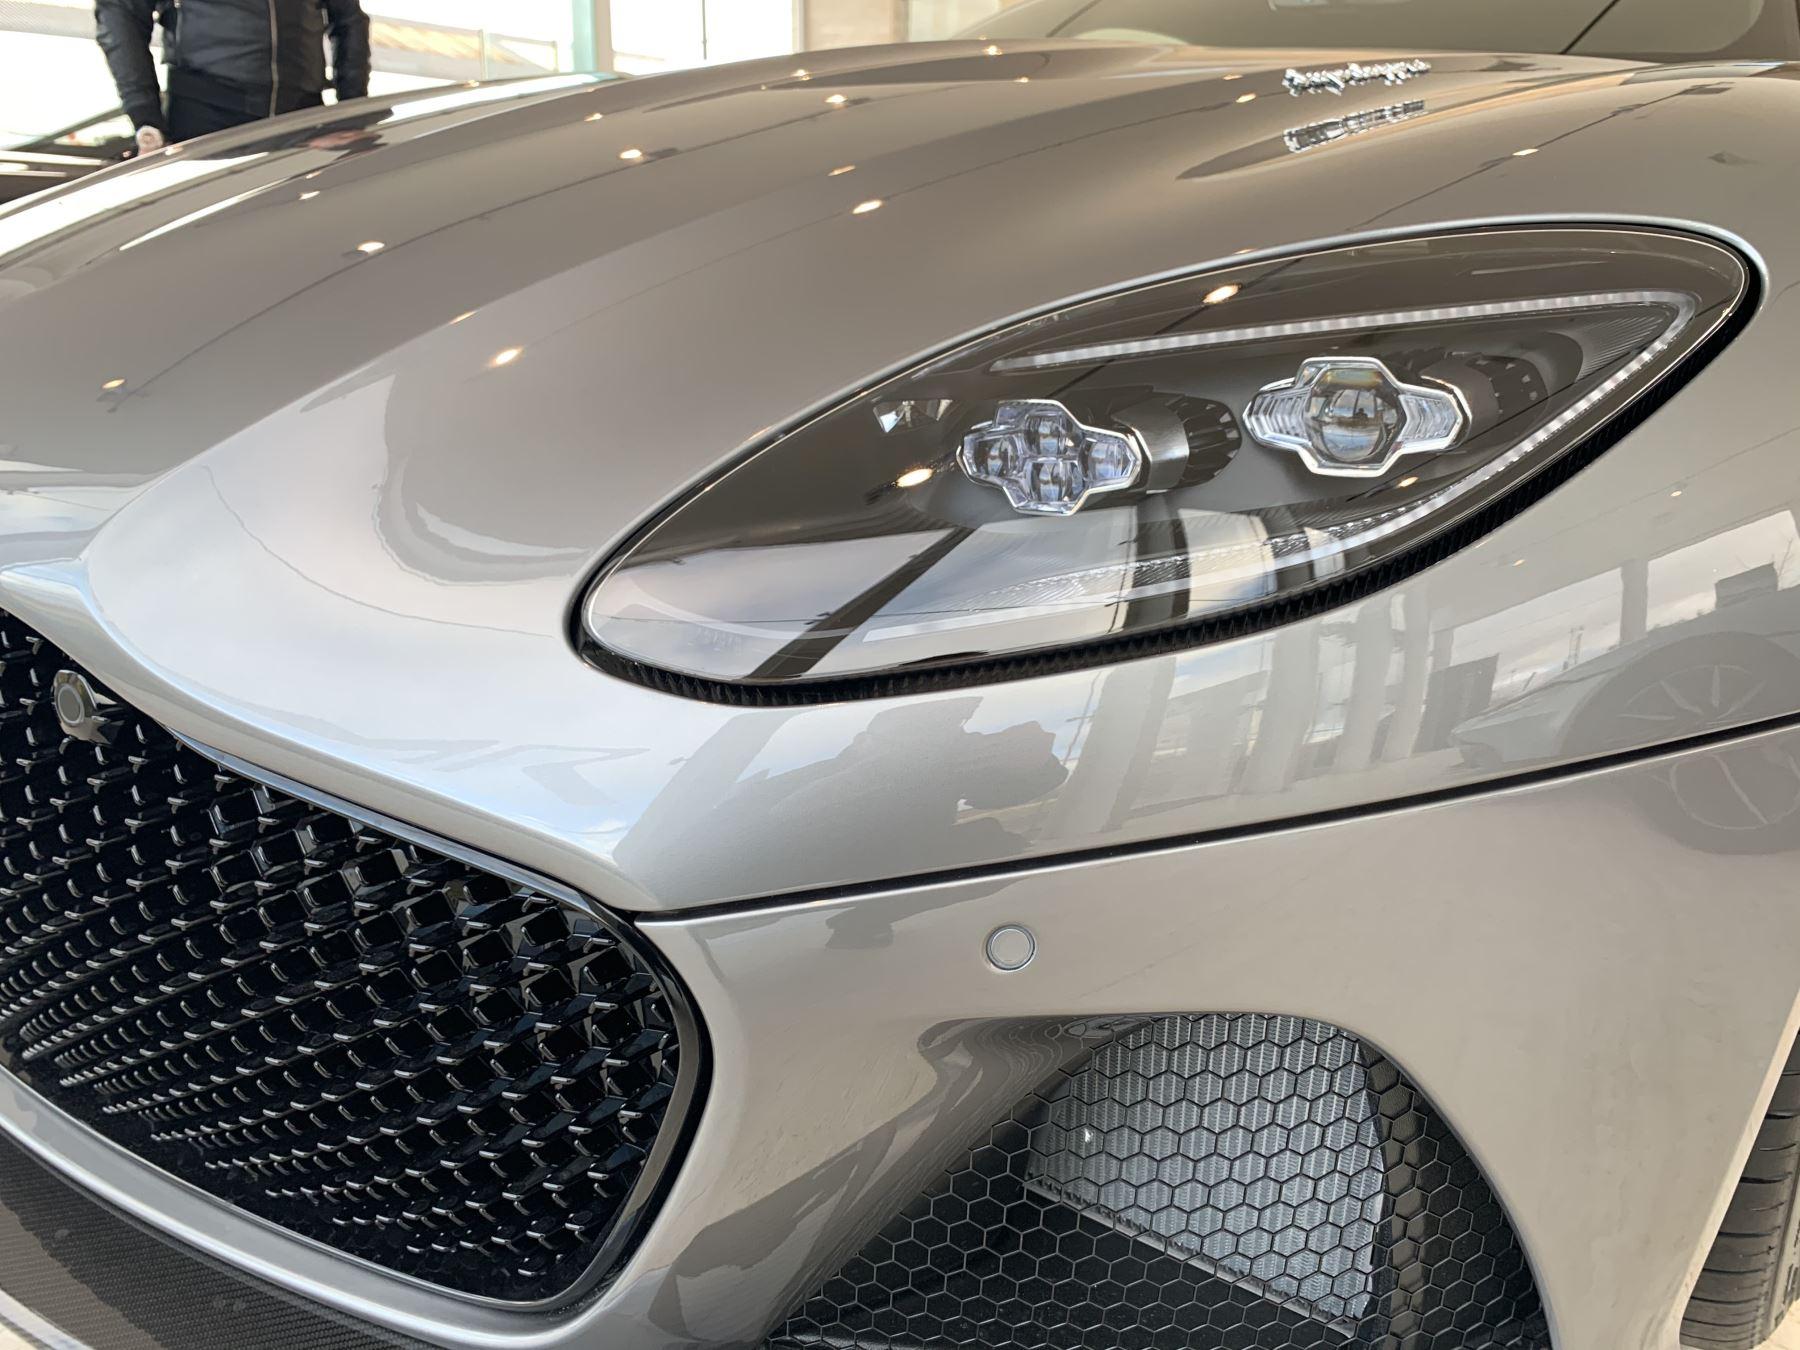 Aston Martin DBS Superleggera V12 Superleggera 2dr Touchtronic Auto image 3